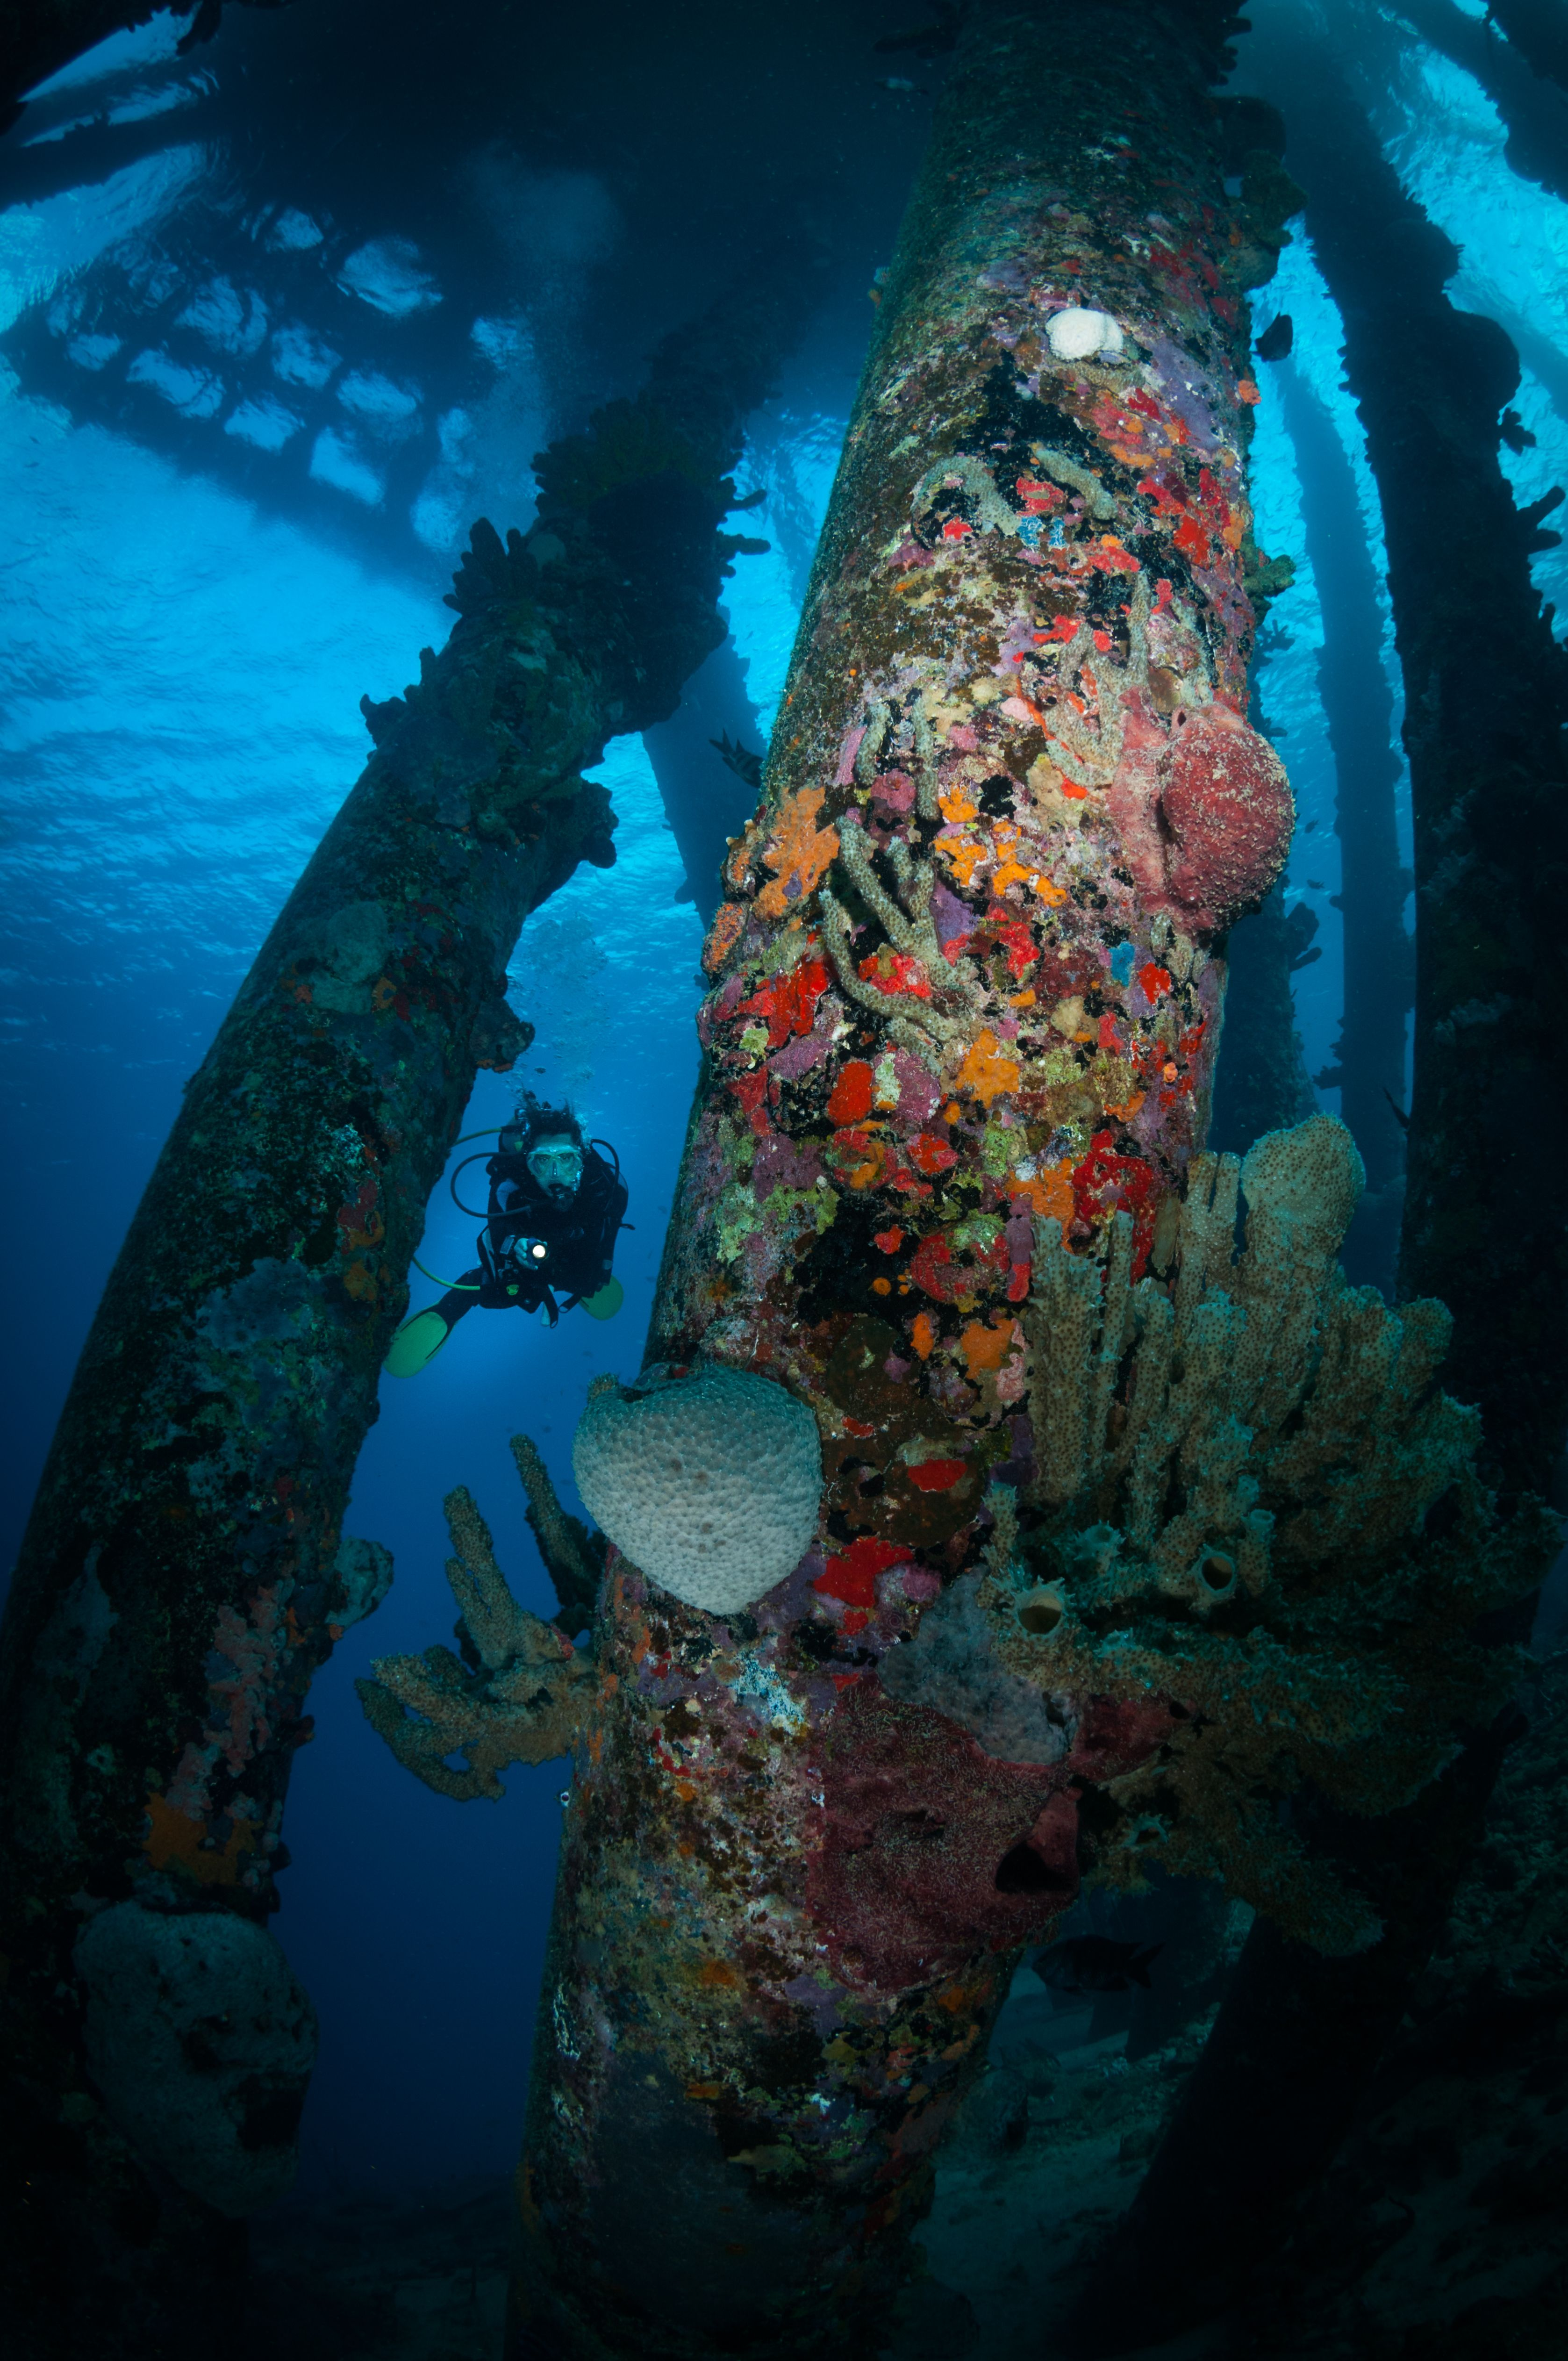 A Divers Guide To Aruba, Bonaire, Curaçao In 2020